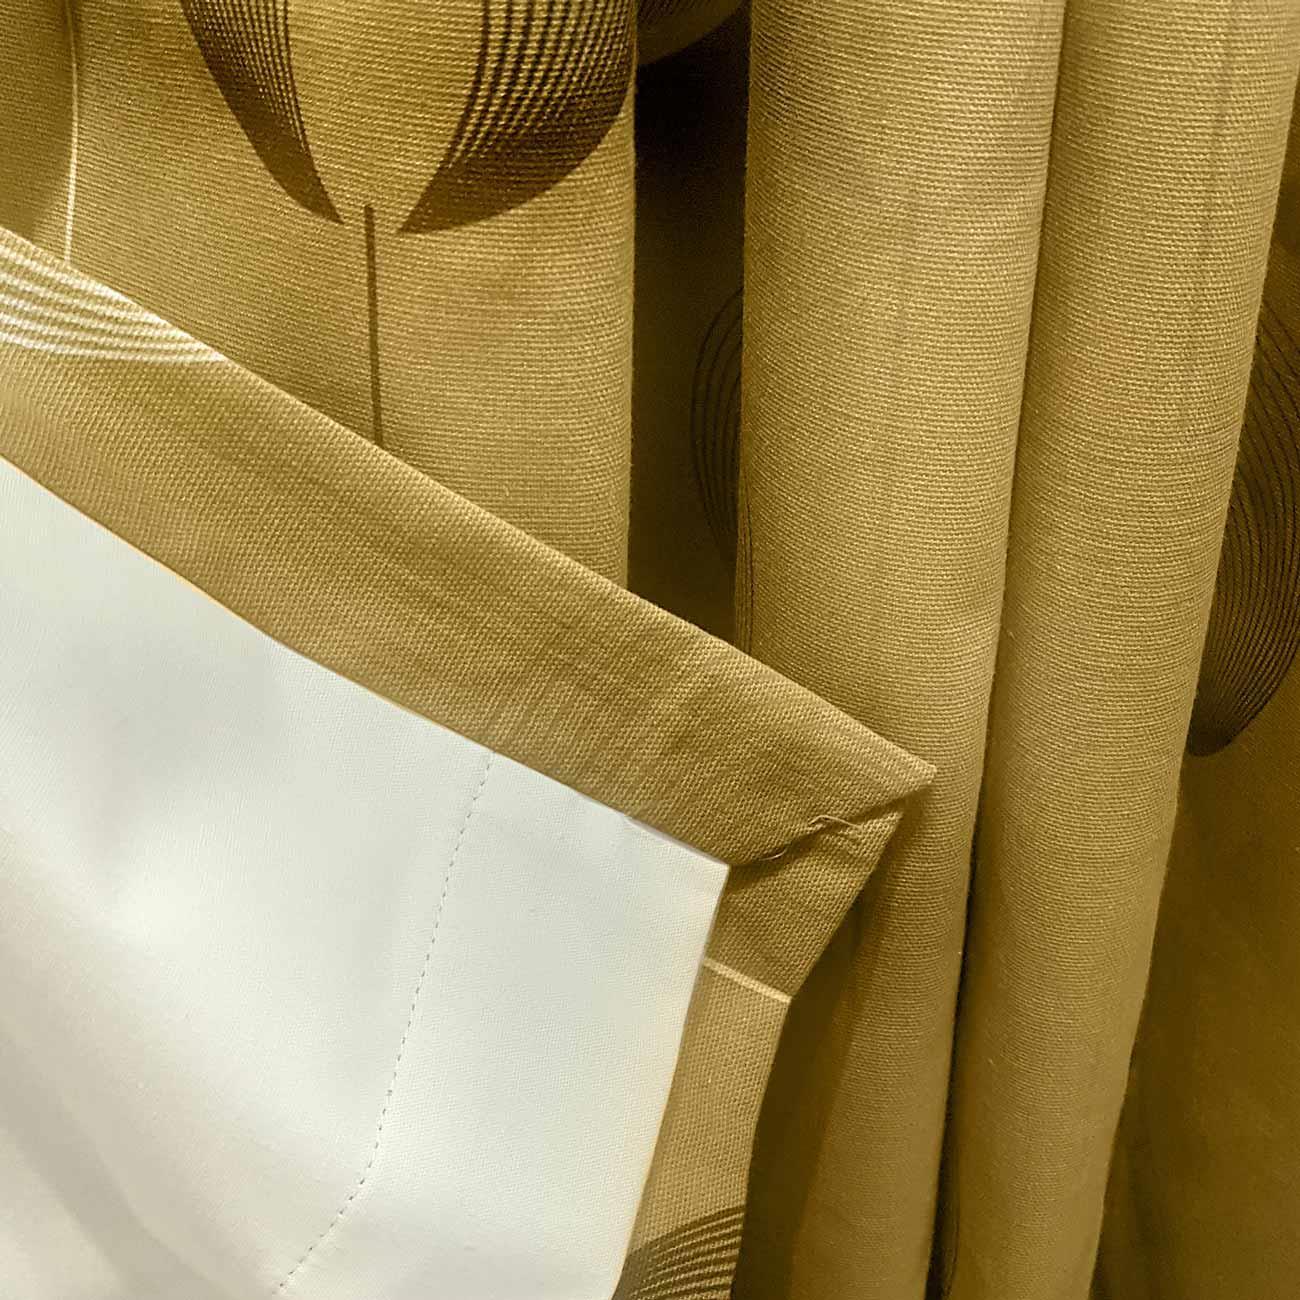 Cortina-con-Ojales-de-mostaza-pares-Amarillo-Ocre-Anillo-Top-Forrado-Listo-Cortinas miniatura 31